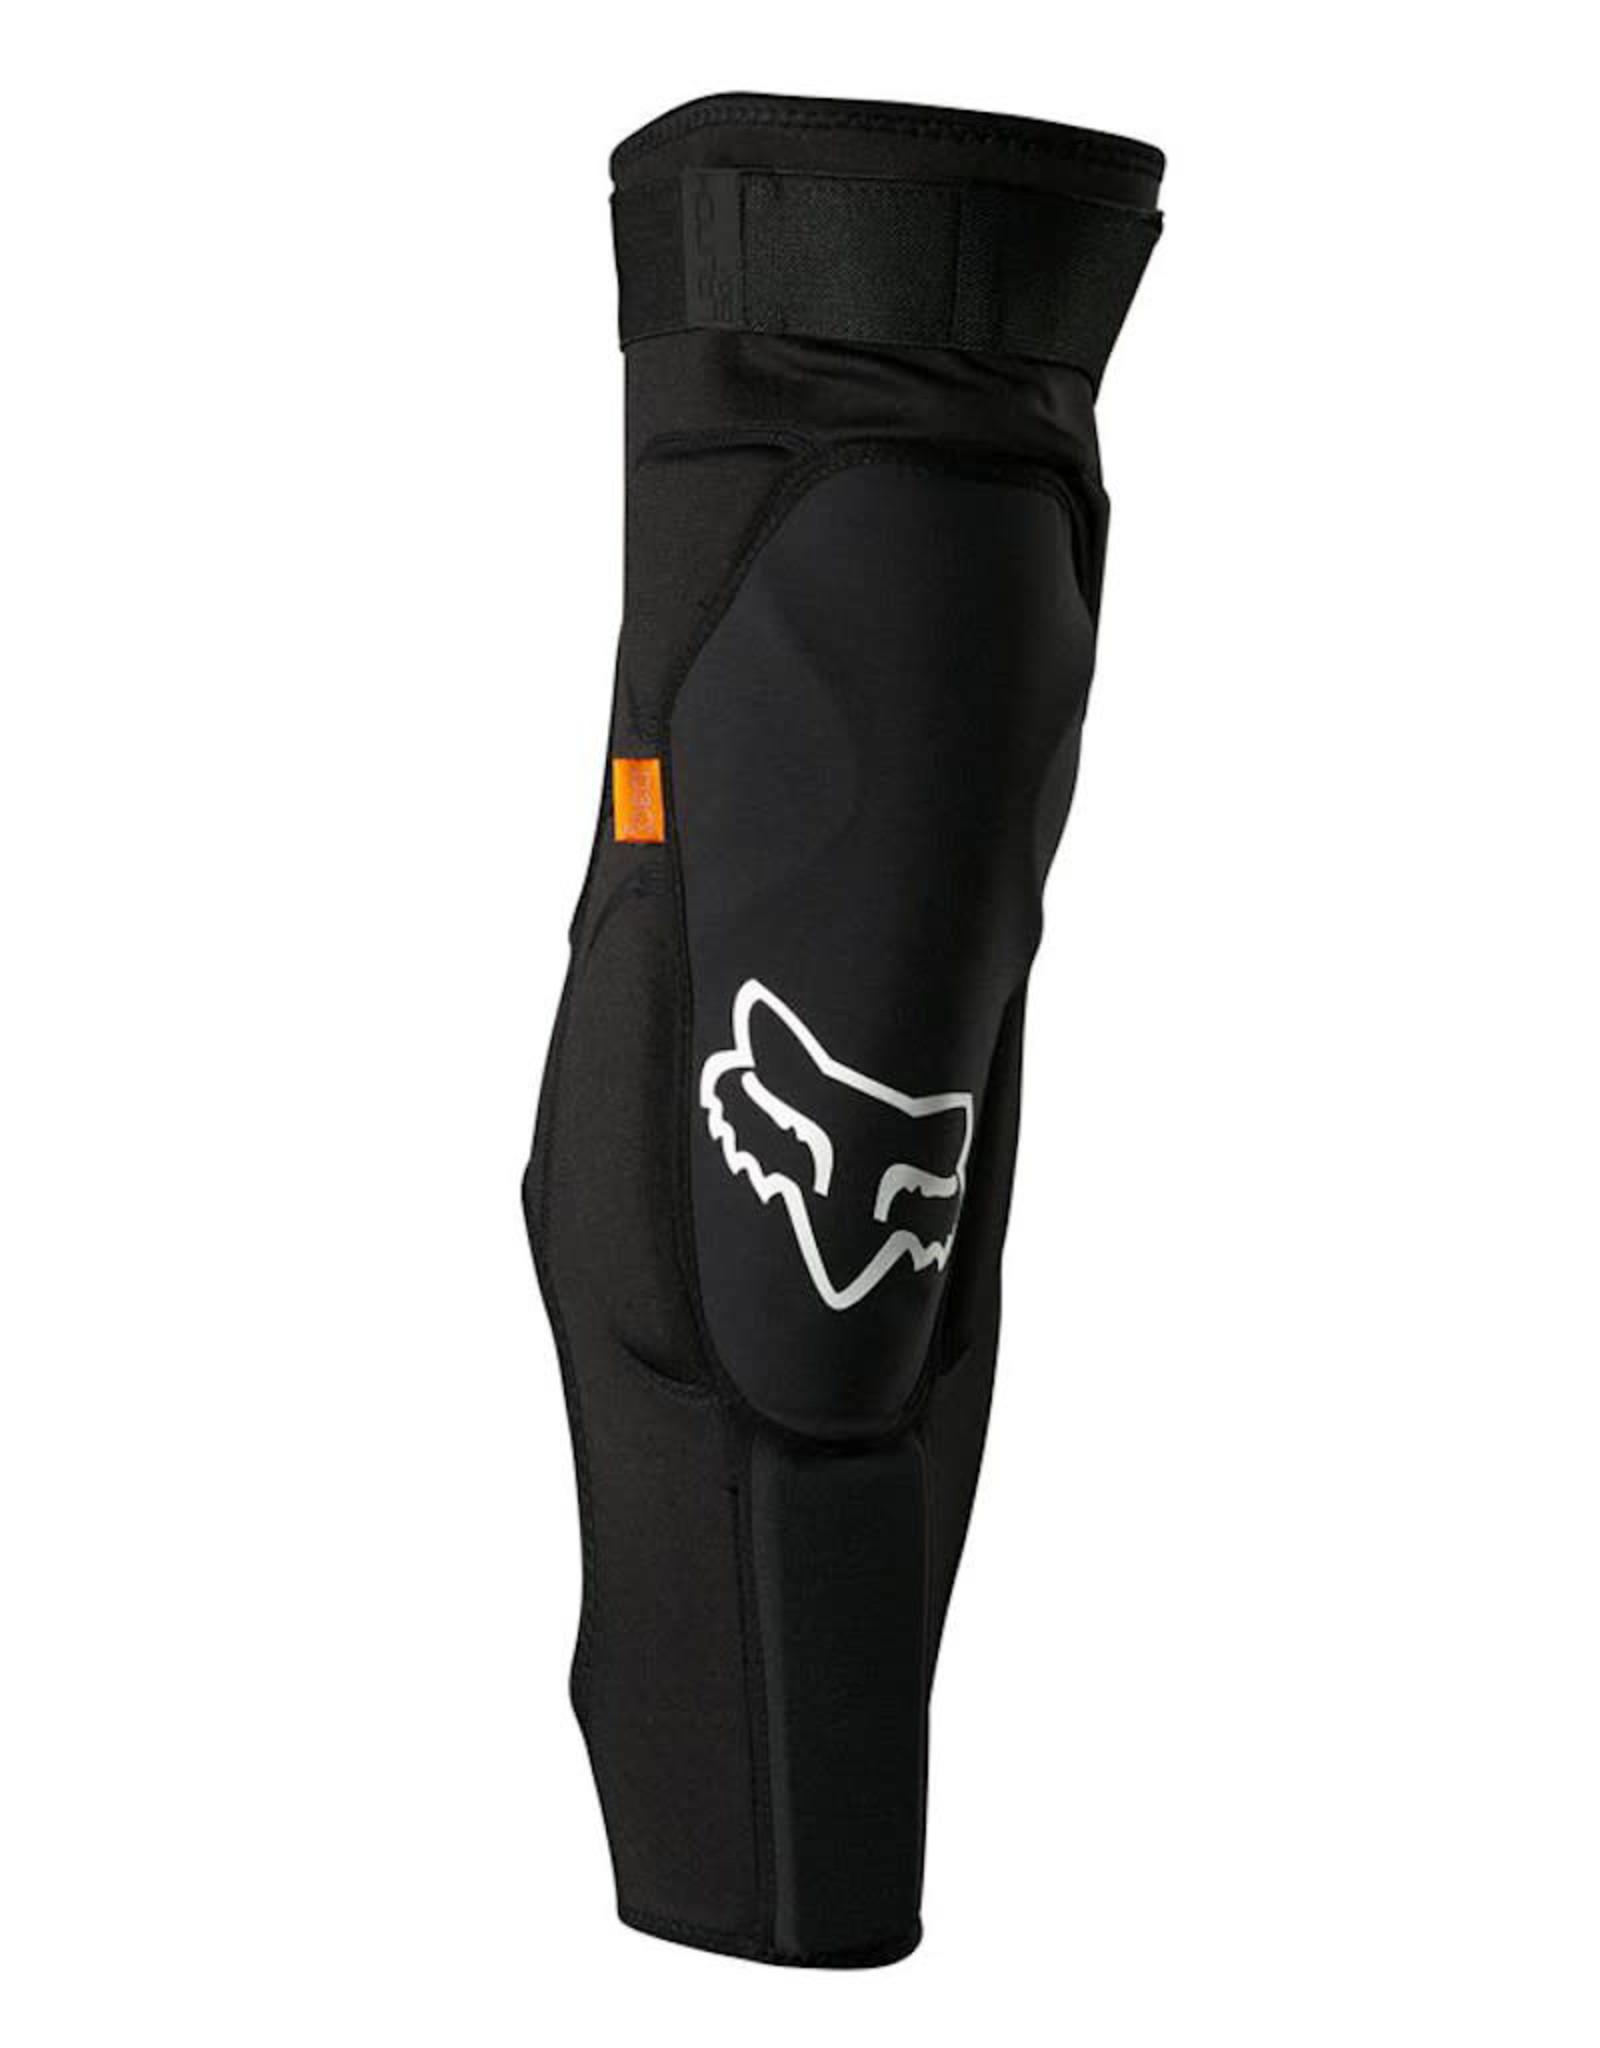 Fox Head Fox - Launch Pro D30 Knee/Shin Guard